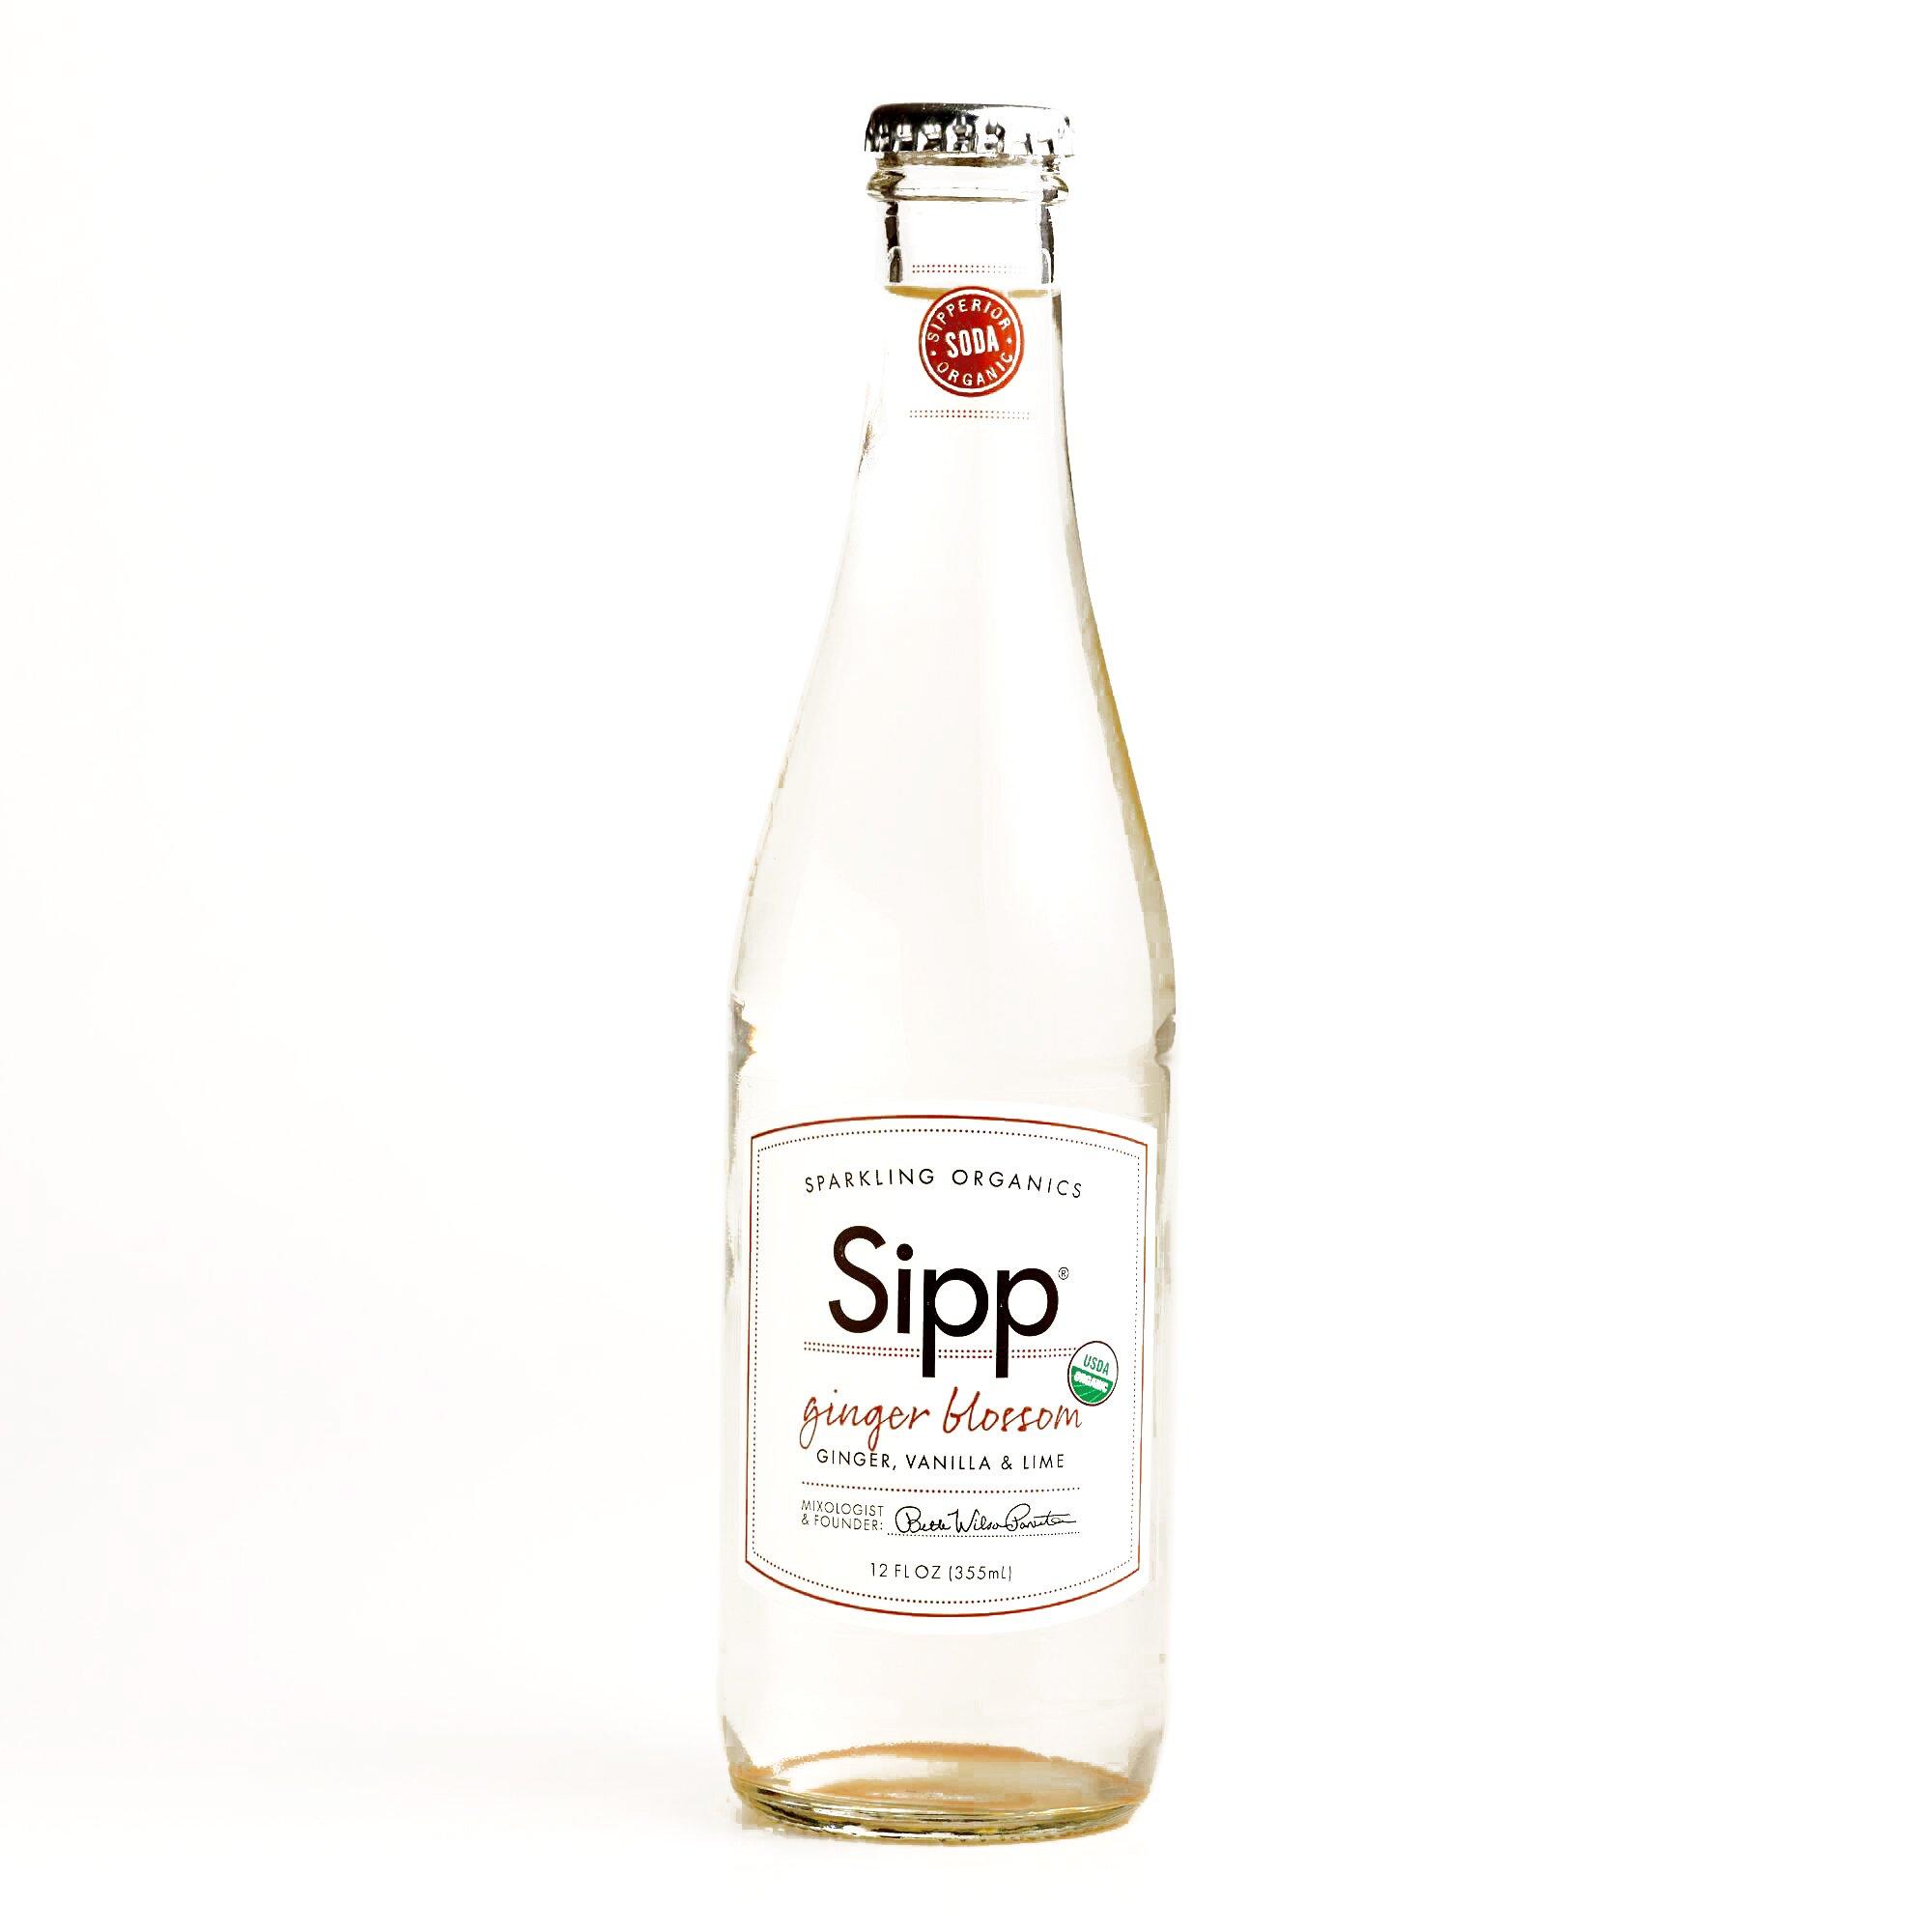 Sipp Organic Ginger Blossom Soda 12 oz each (1 Item Per Order)